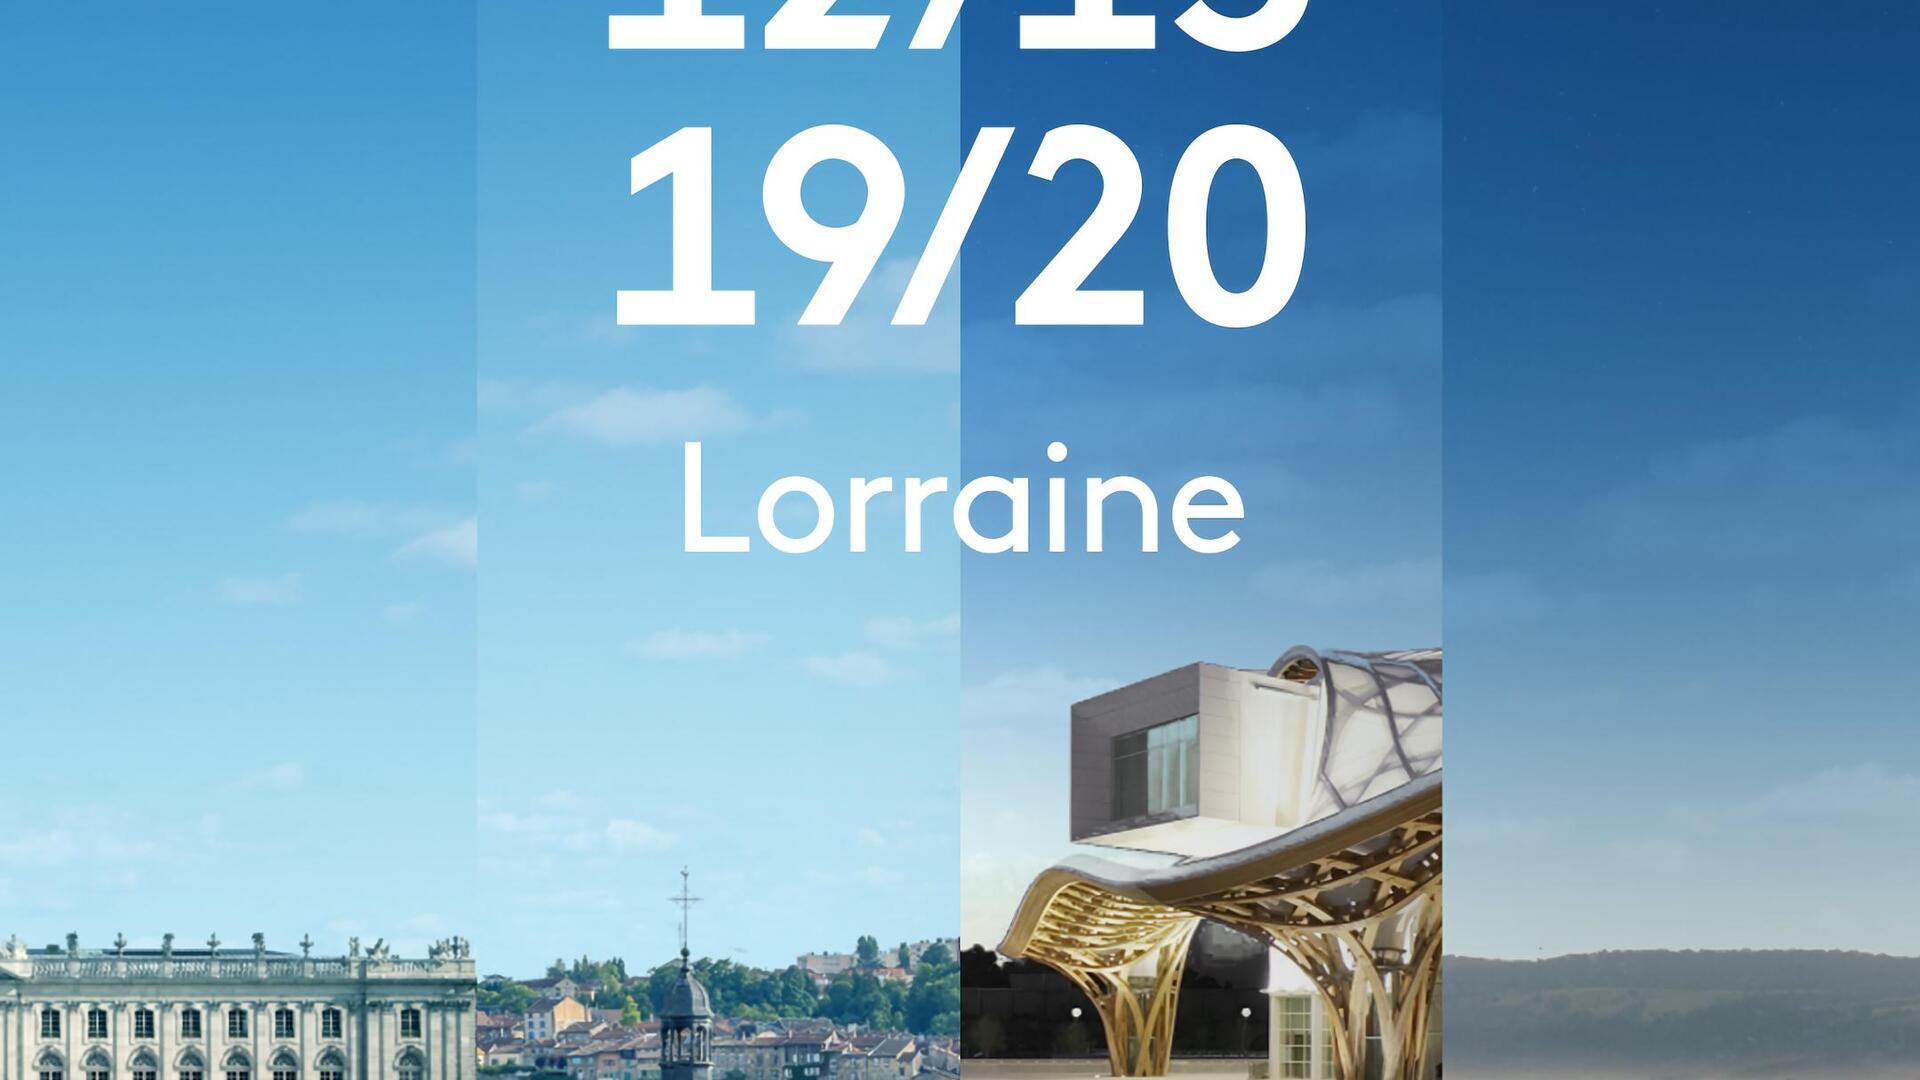 19/20 Lorraine